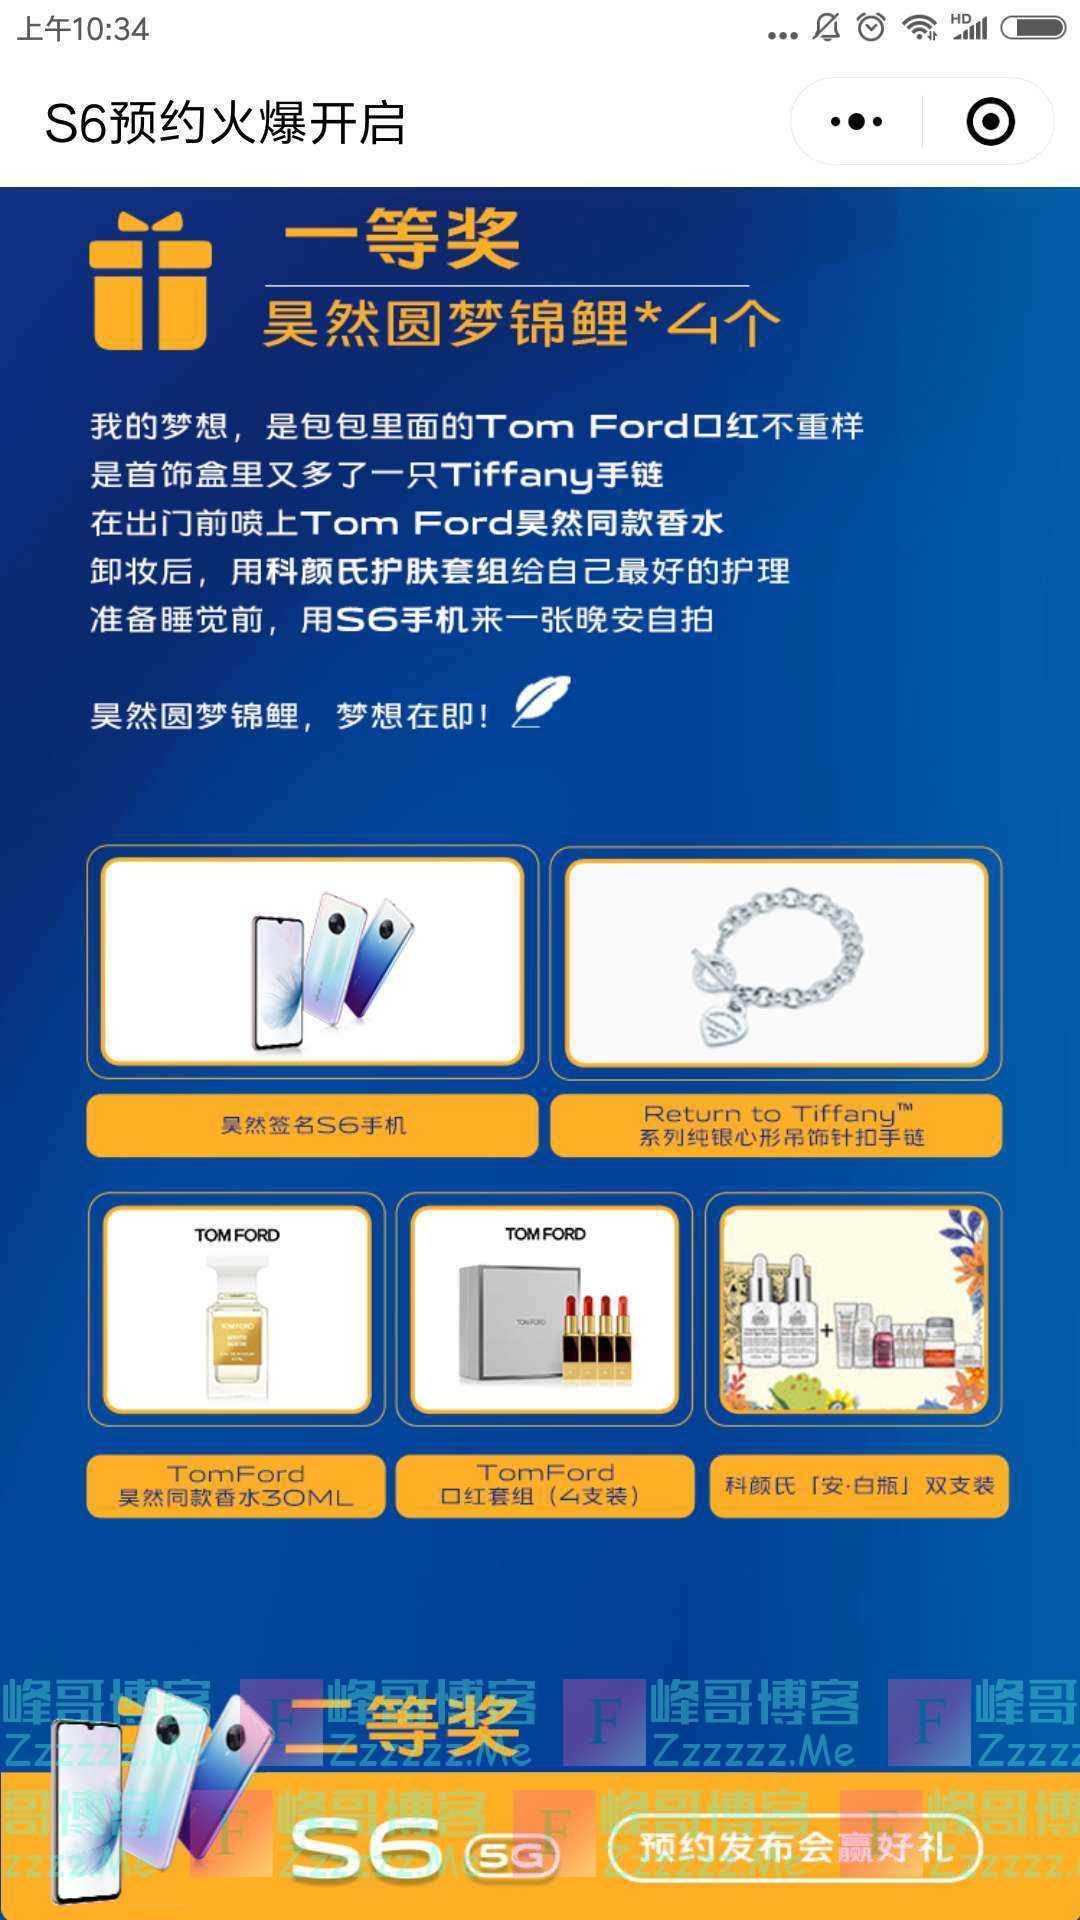 vivo官方商城S6预约发布会赢好礼(截止3月31日)